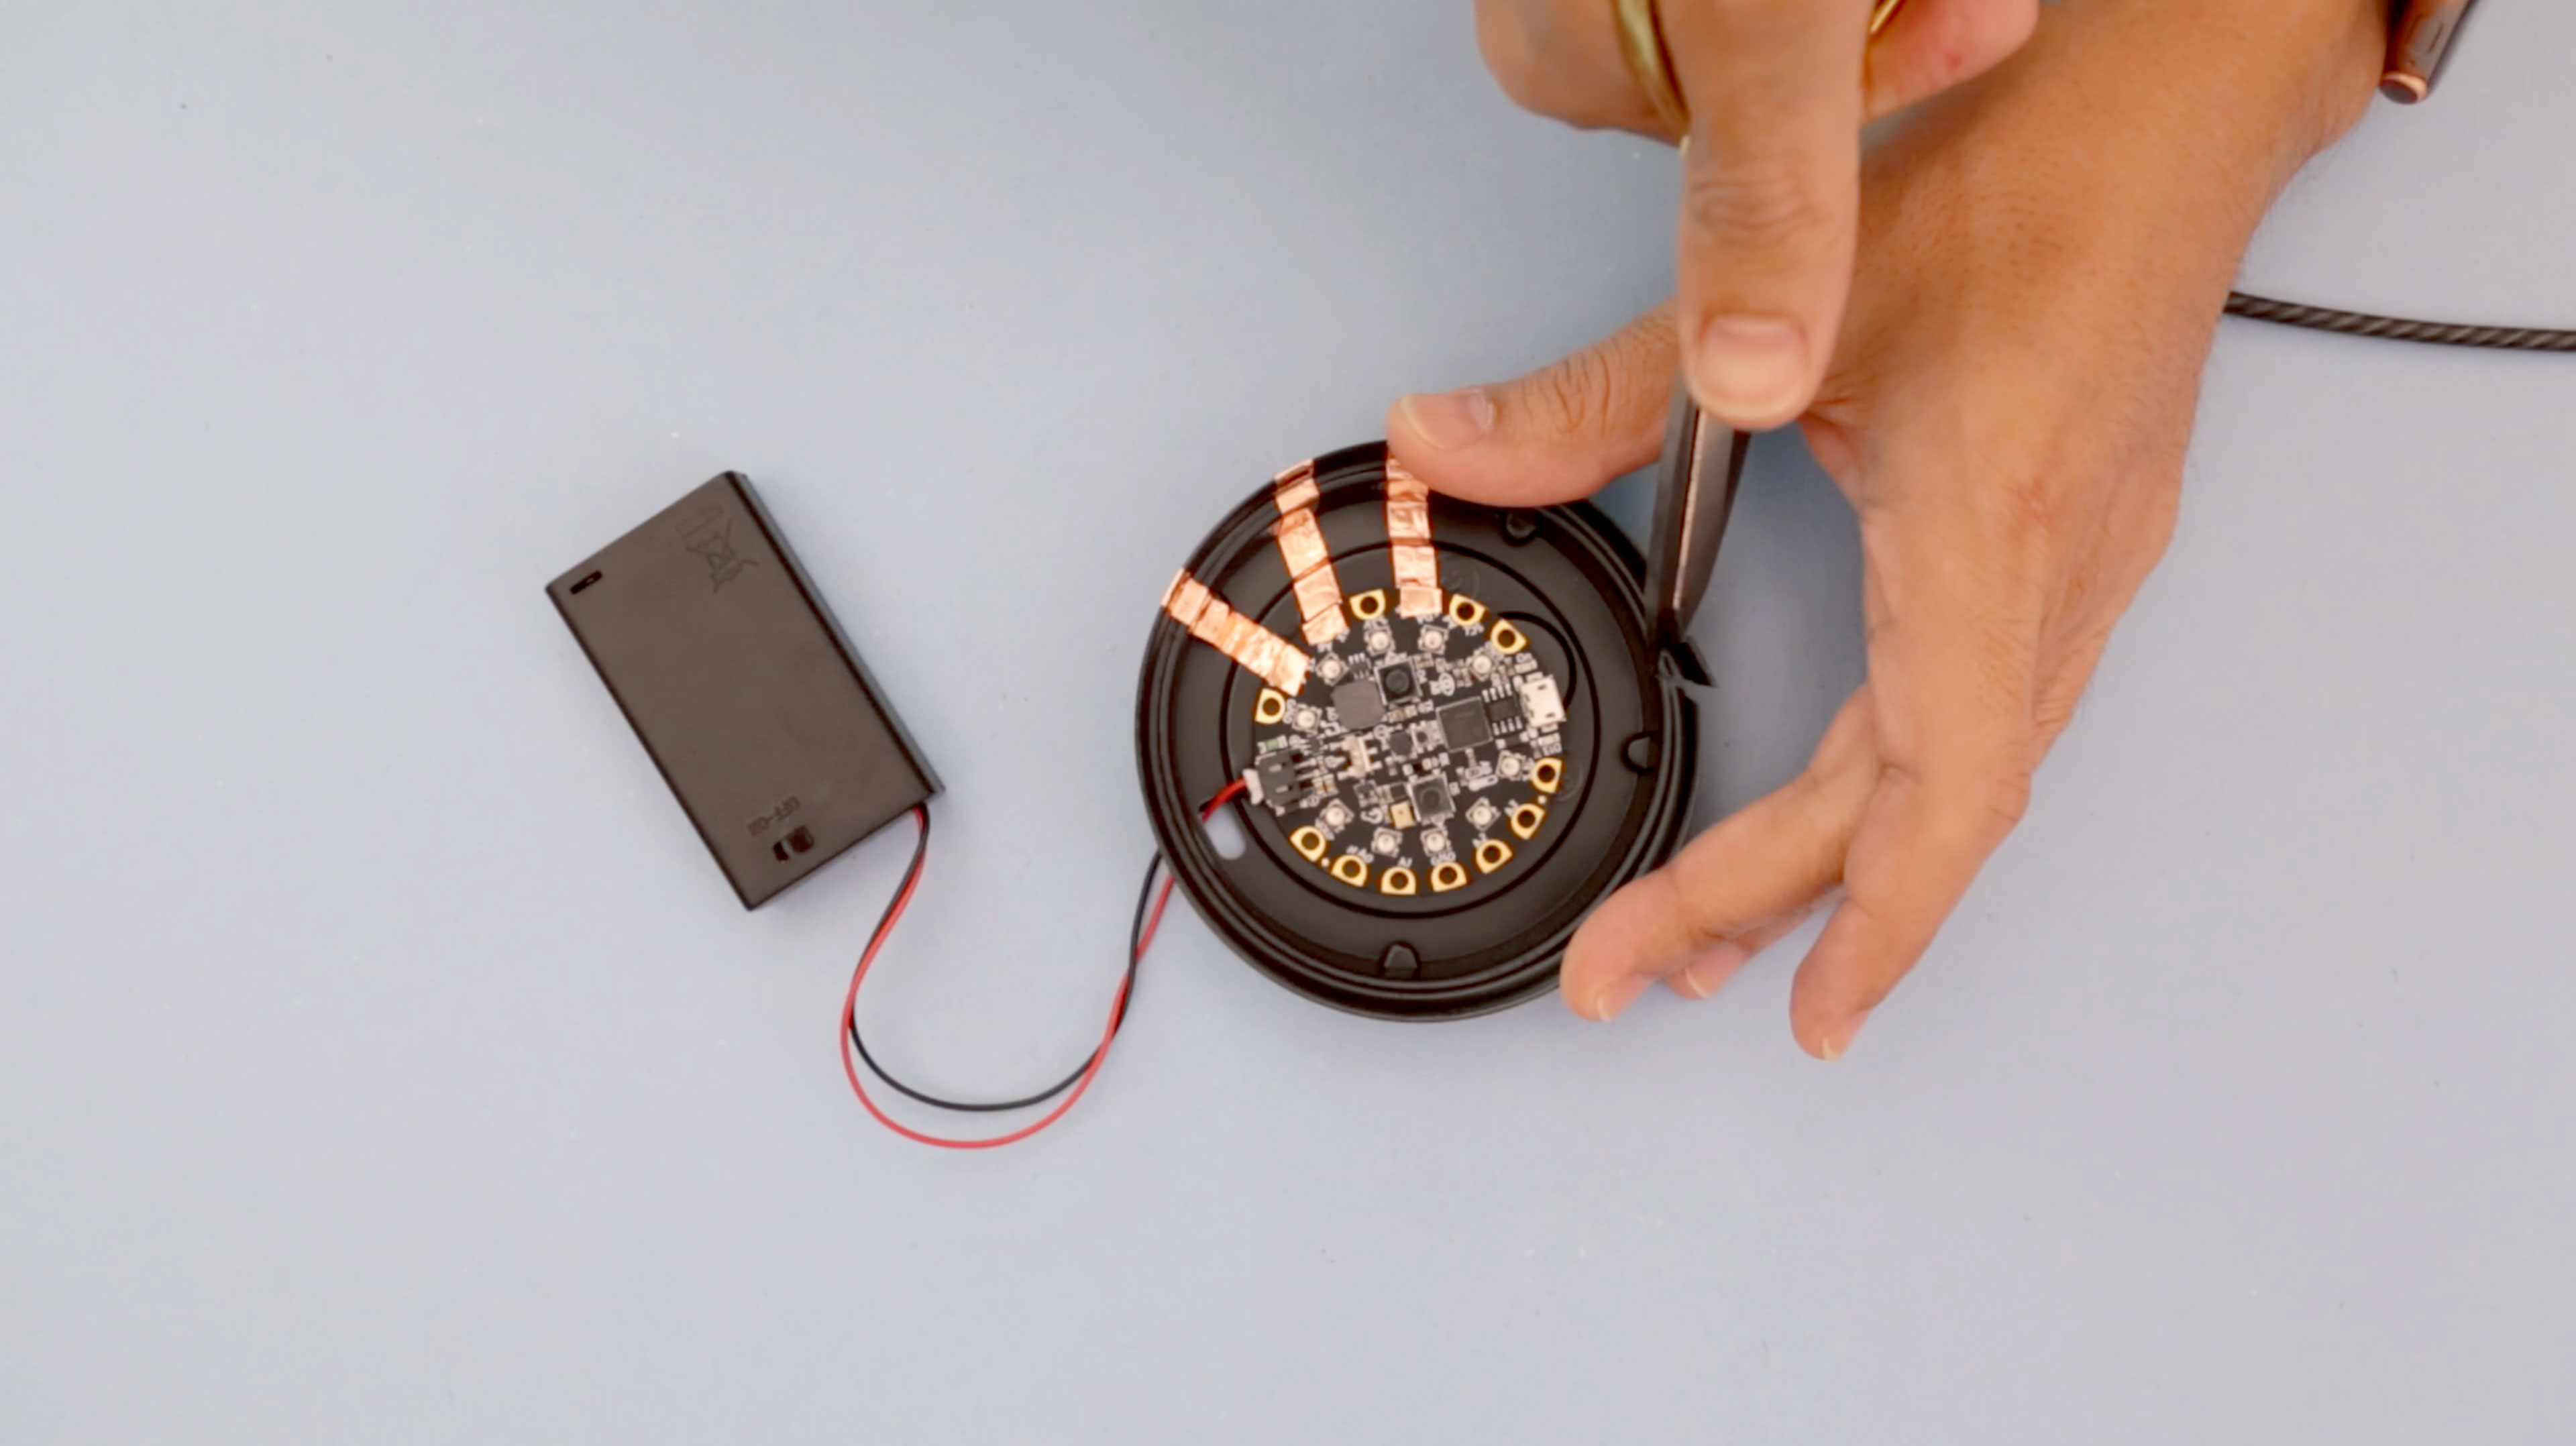 circuit_playground_lid-usb-open.jpg